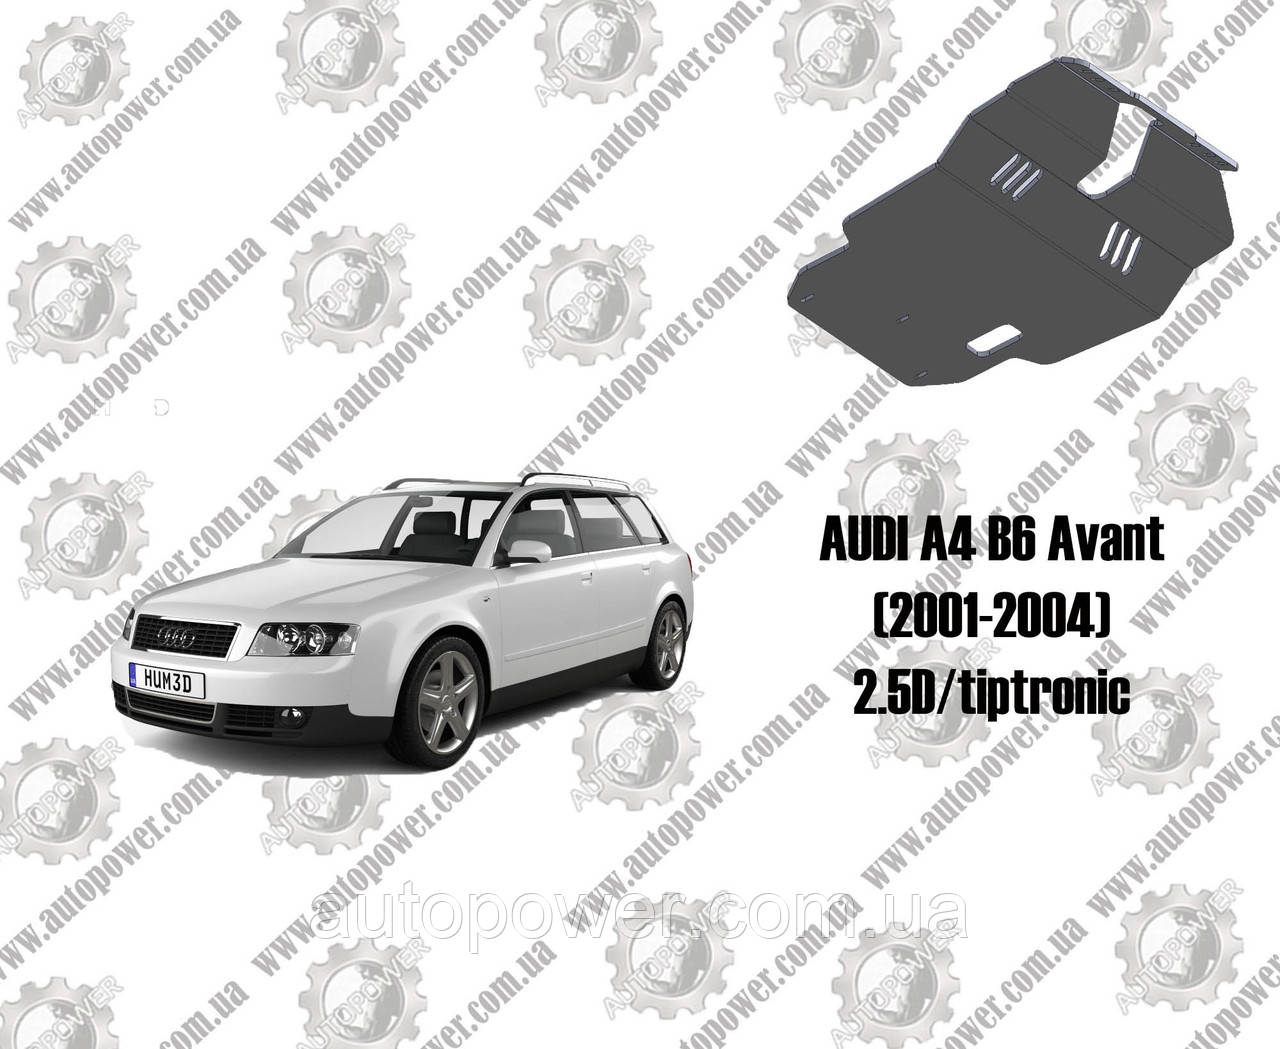 Защита двигателя и коробки передач AUDI A4 B6 Avant (2001-2004) 2.5D/tiptronic